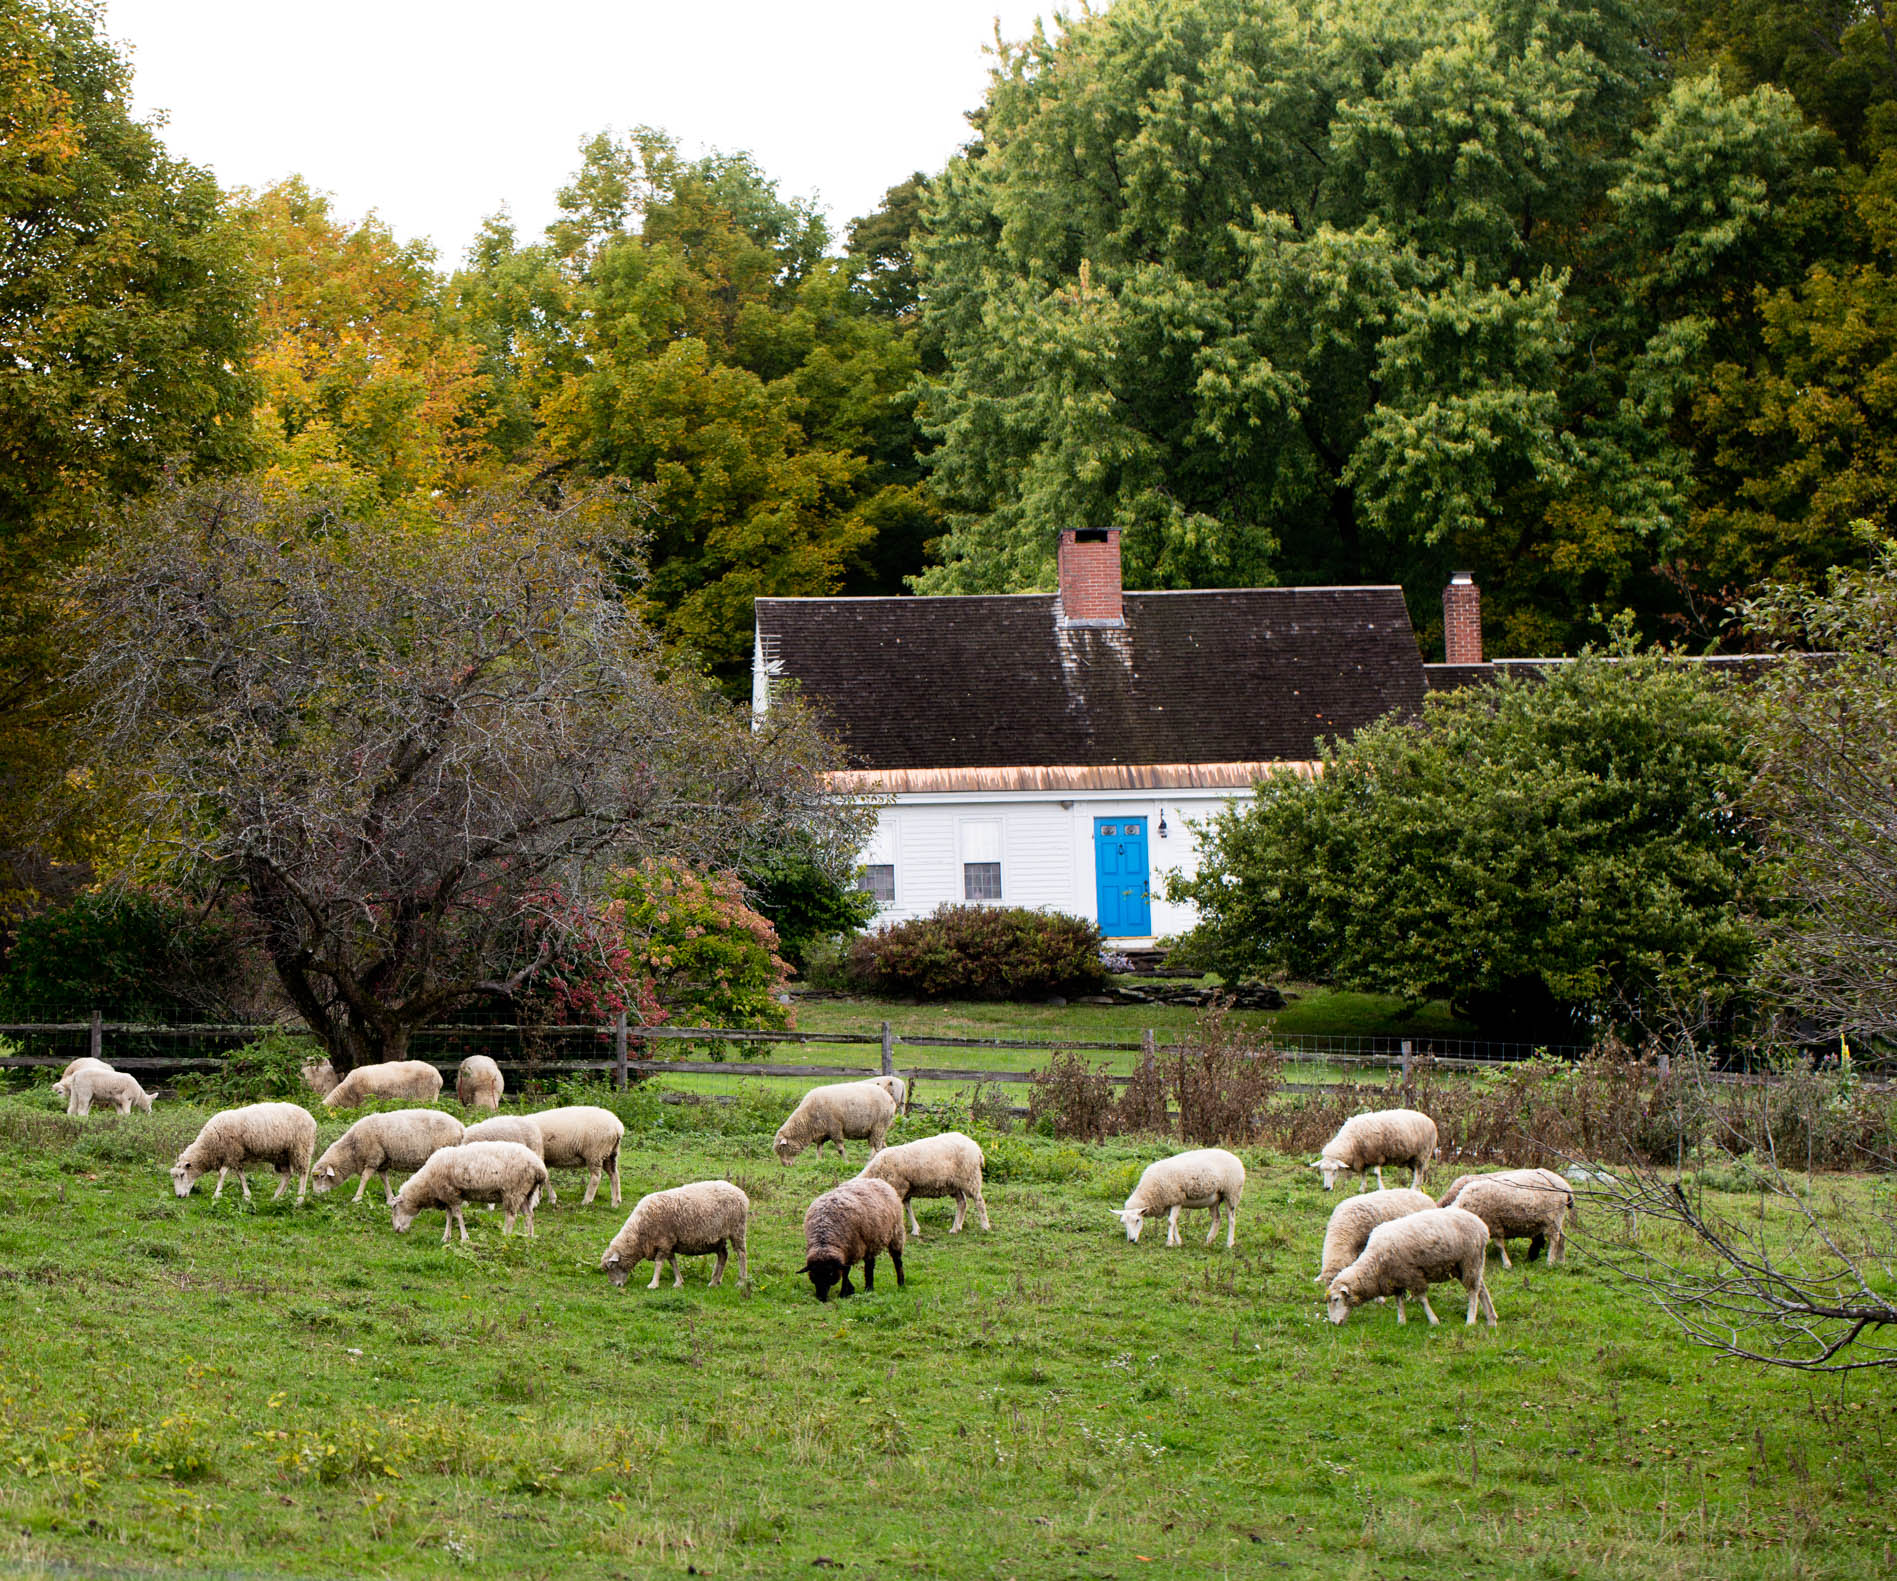 sheep-grazing-in-field-home.jpg